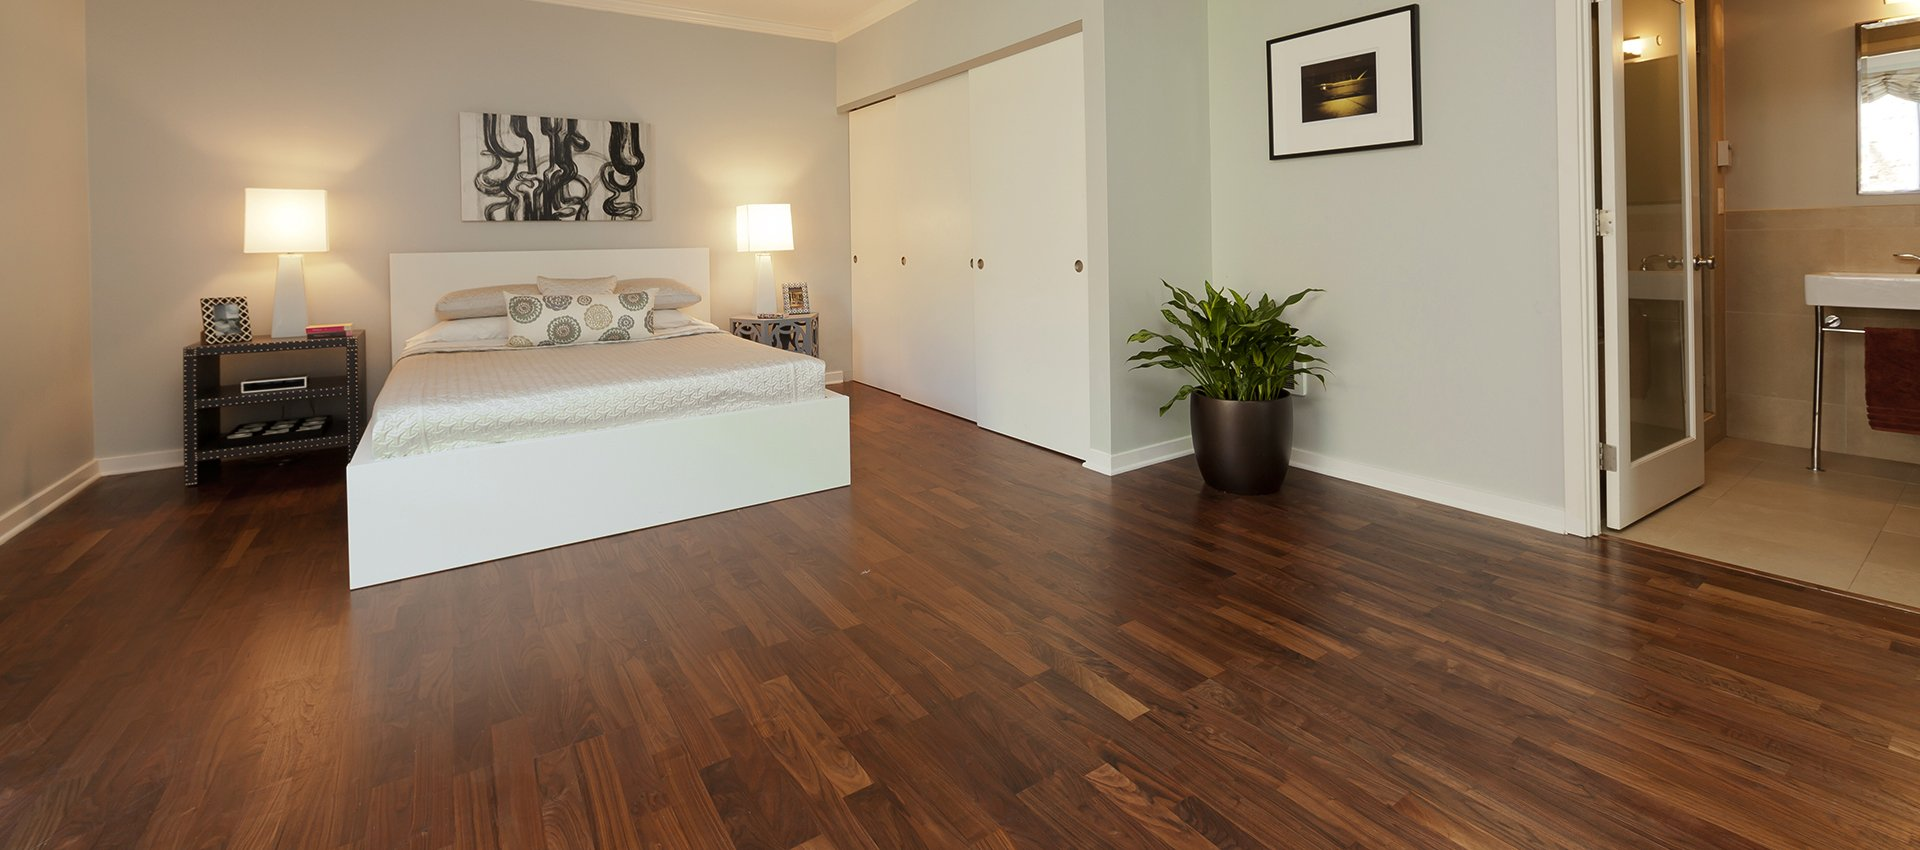 dark wooden flooring